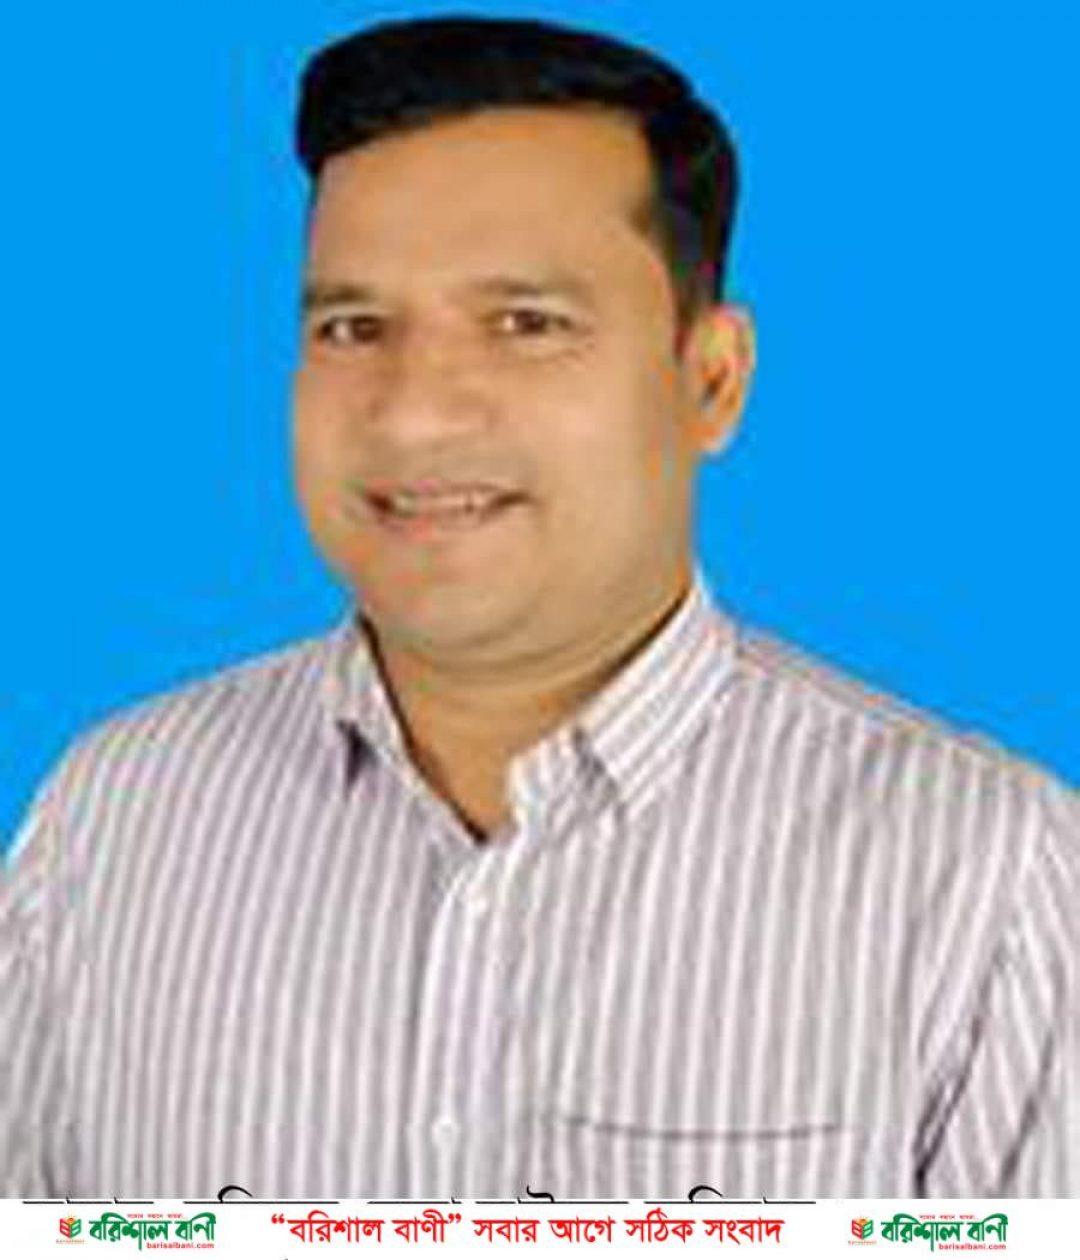 Madaripur 25-09-21 (Expulsion leader) Pic.